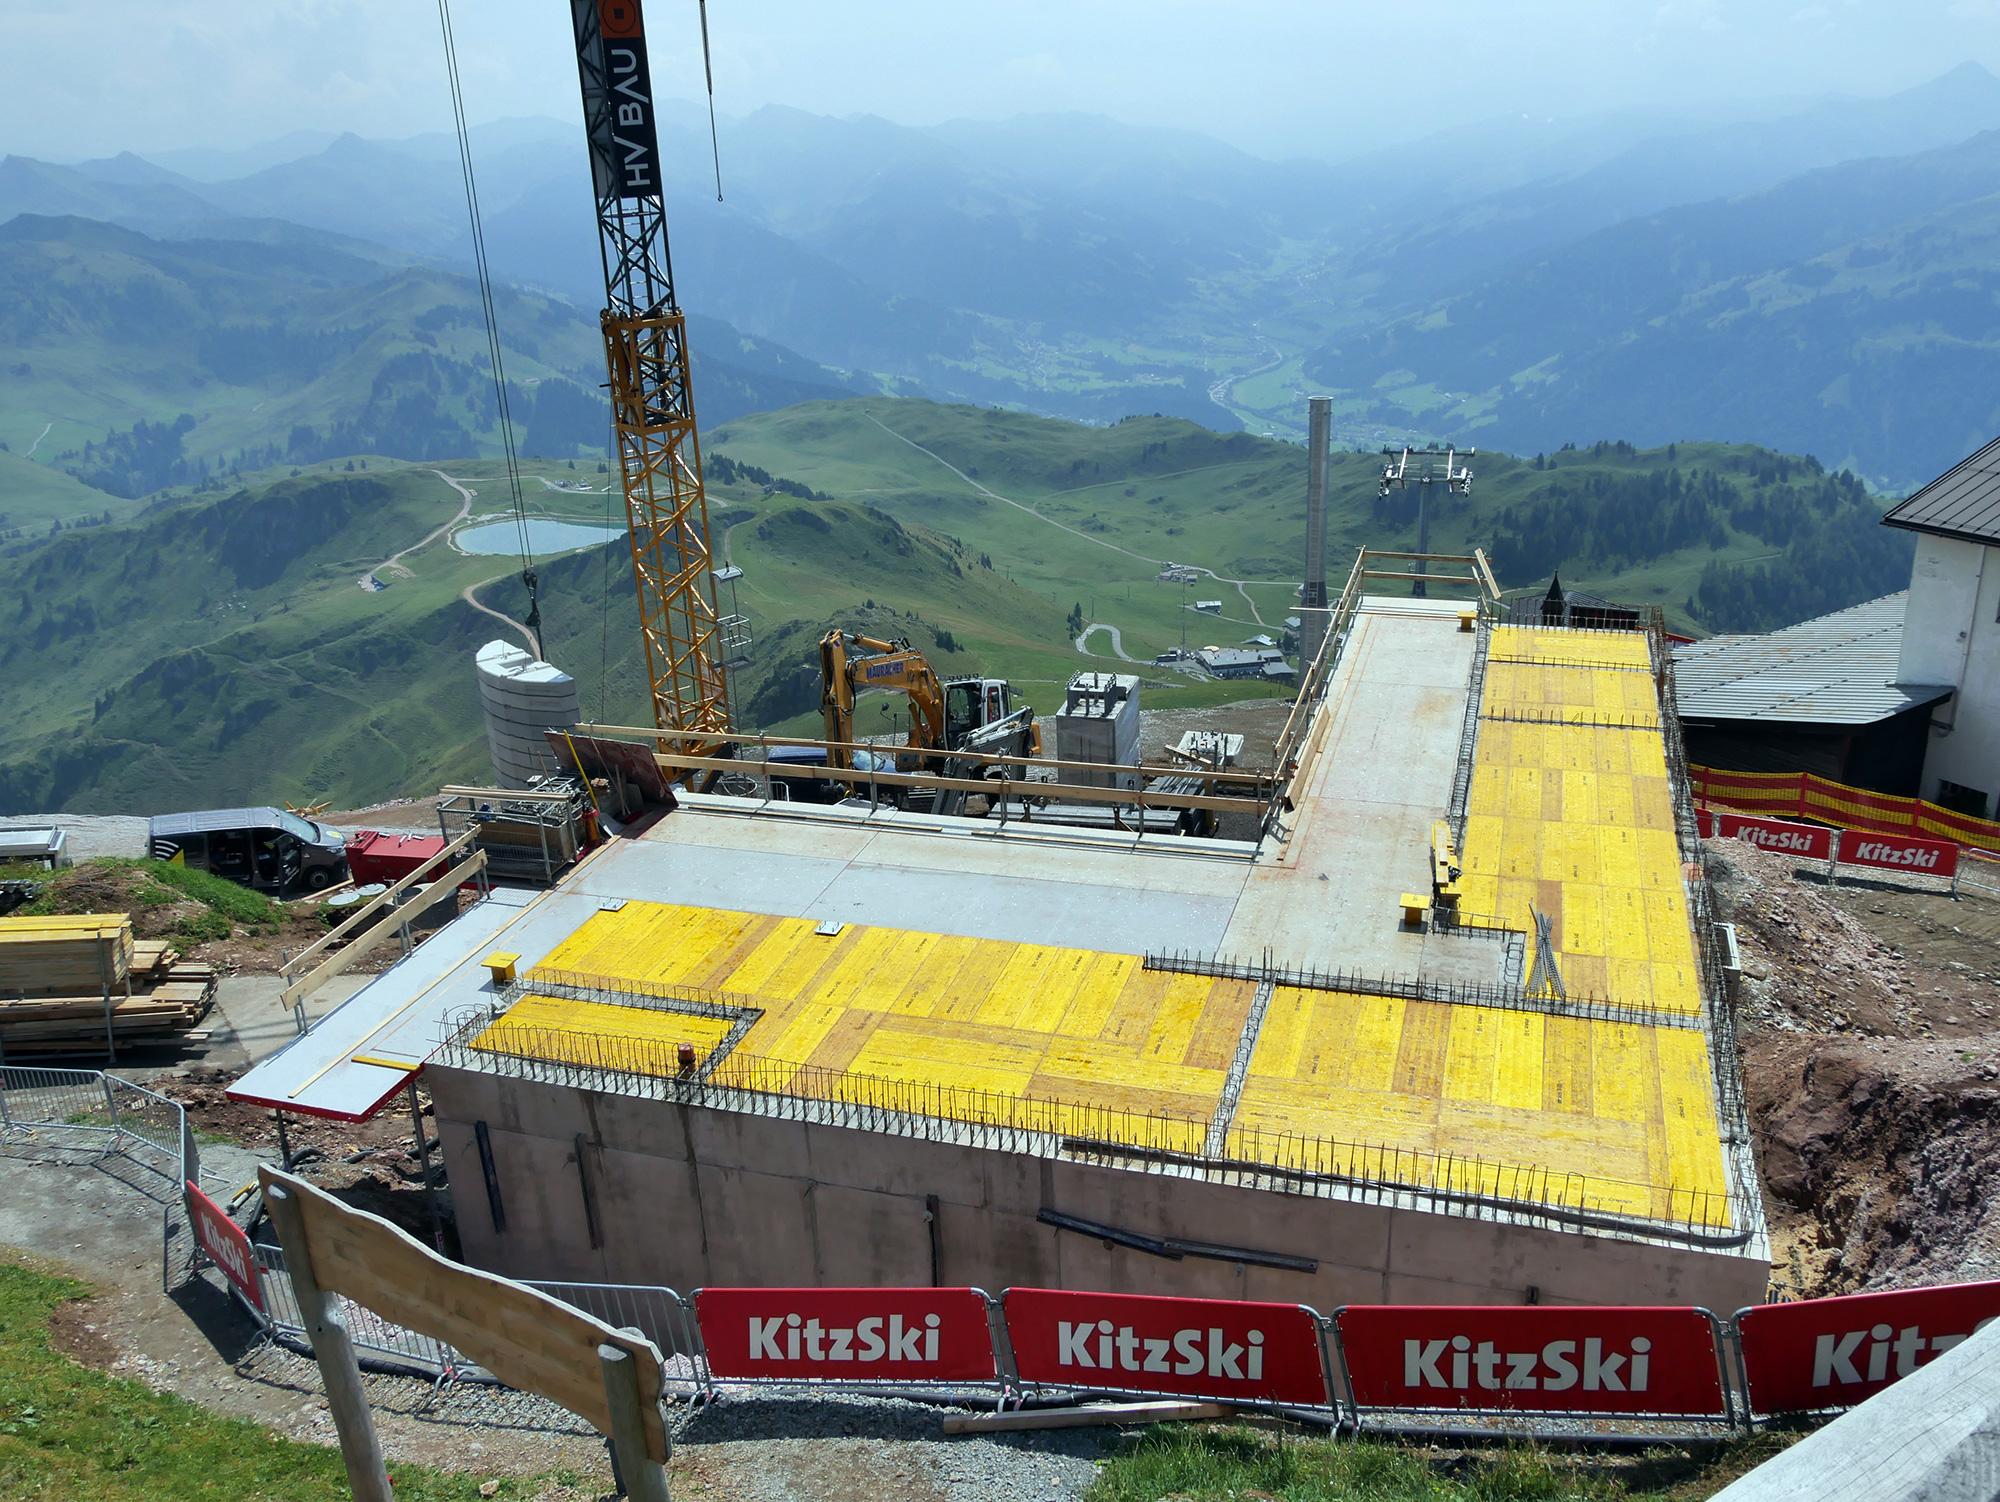 Baustelle 6SB Brunellen am Kitzbüheler Horn © Christian Schön